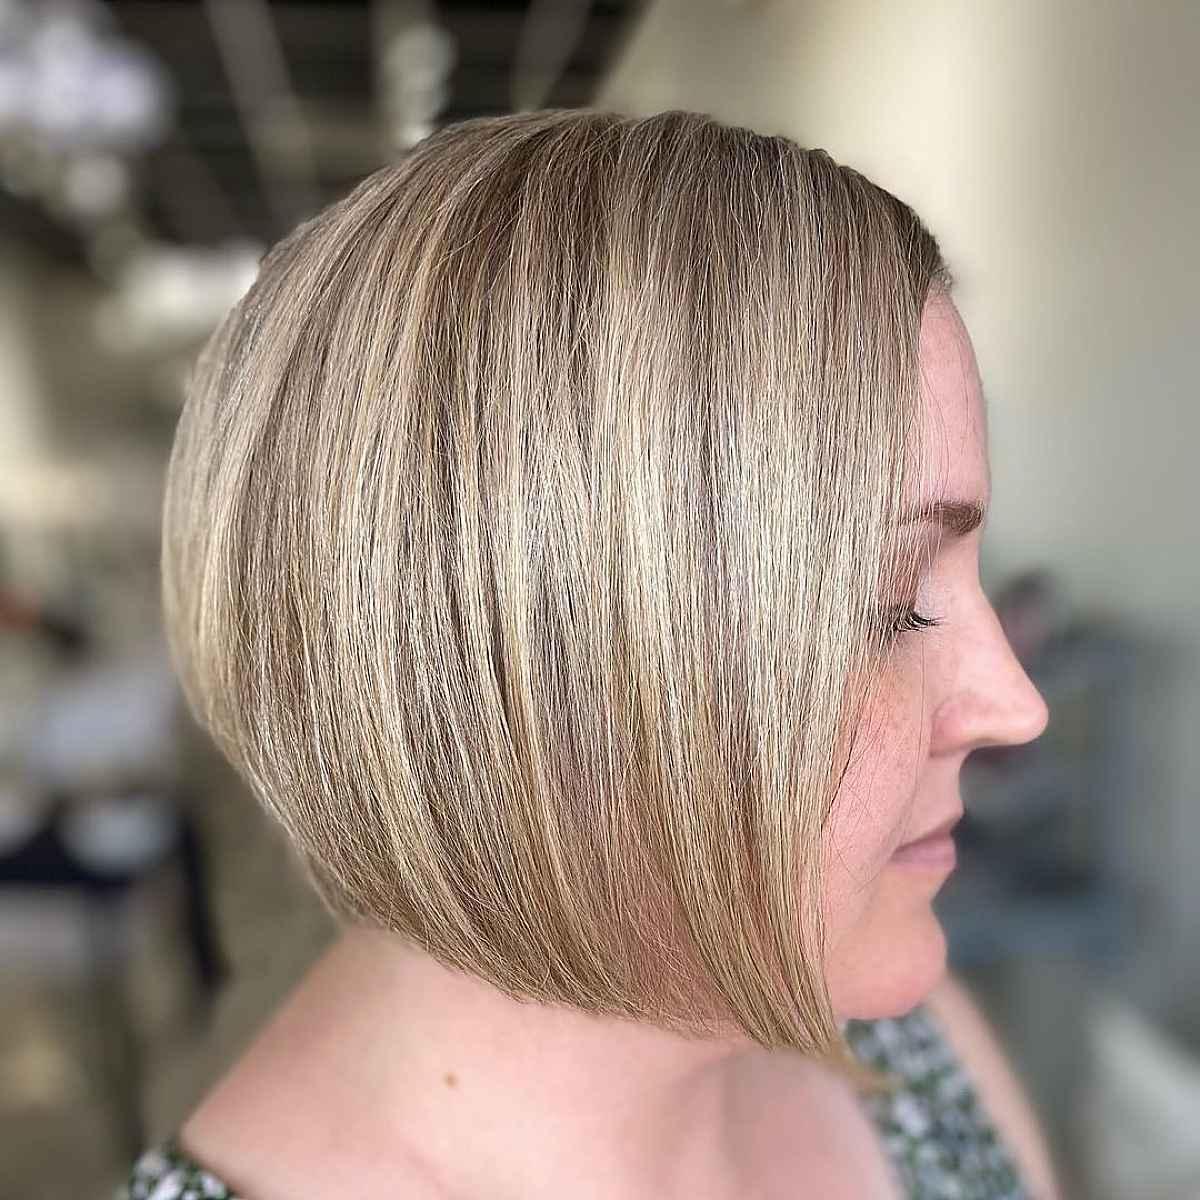 corte bob invertido apilado para cabello corto y fino